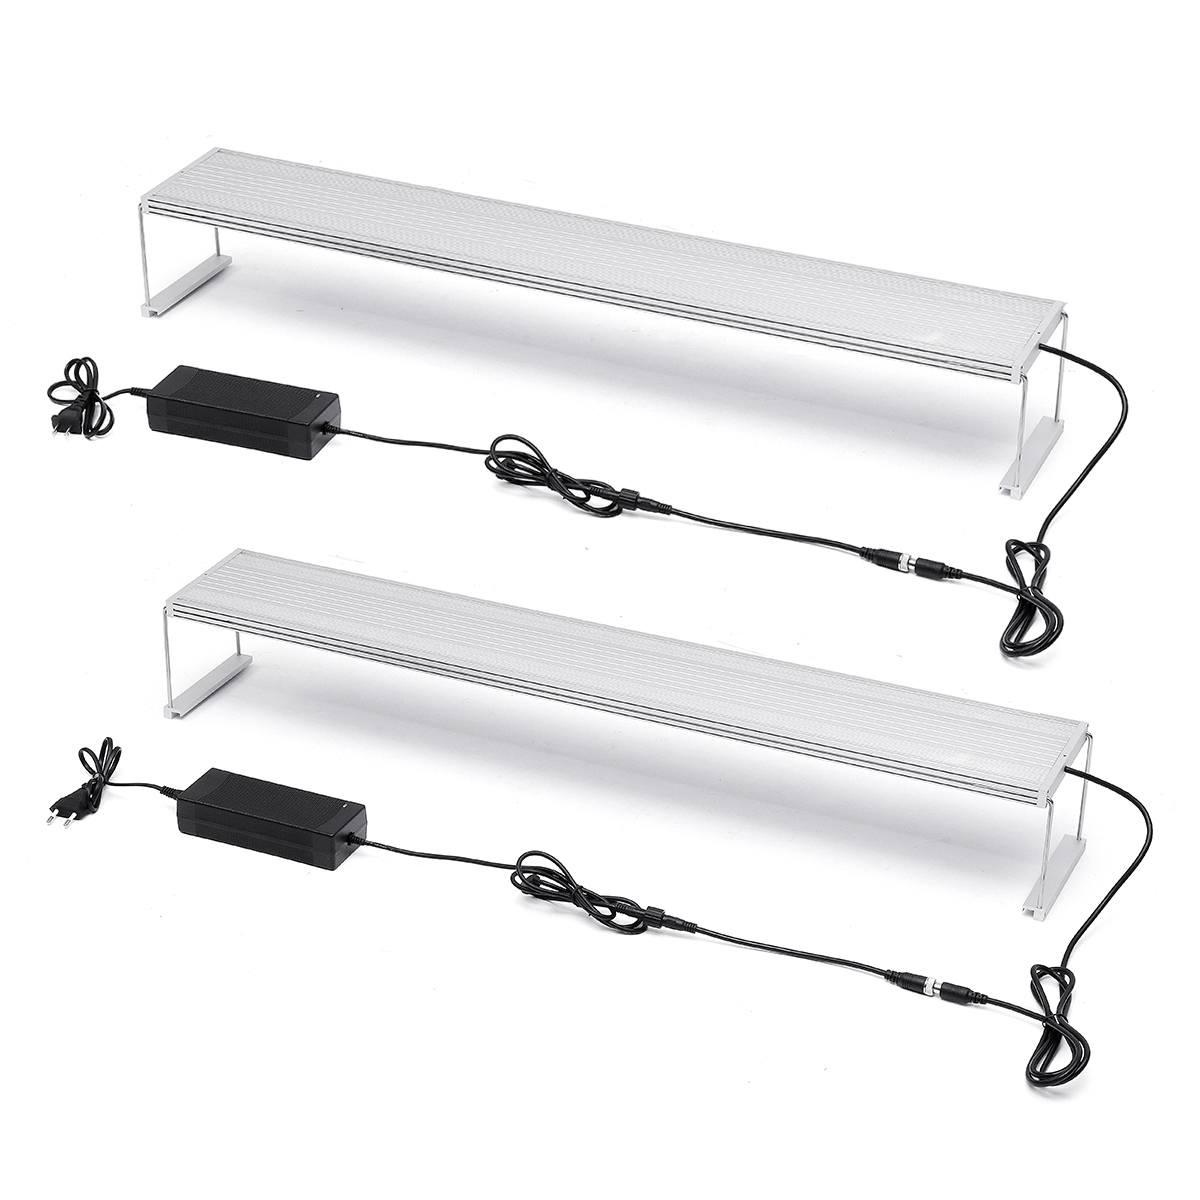 WRGB90 Series Aquarium 75W 306 LED Lighting System LED Grow Light With Commander Controller For 90-110cm Fish Tank EU/US Plug